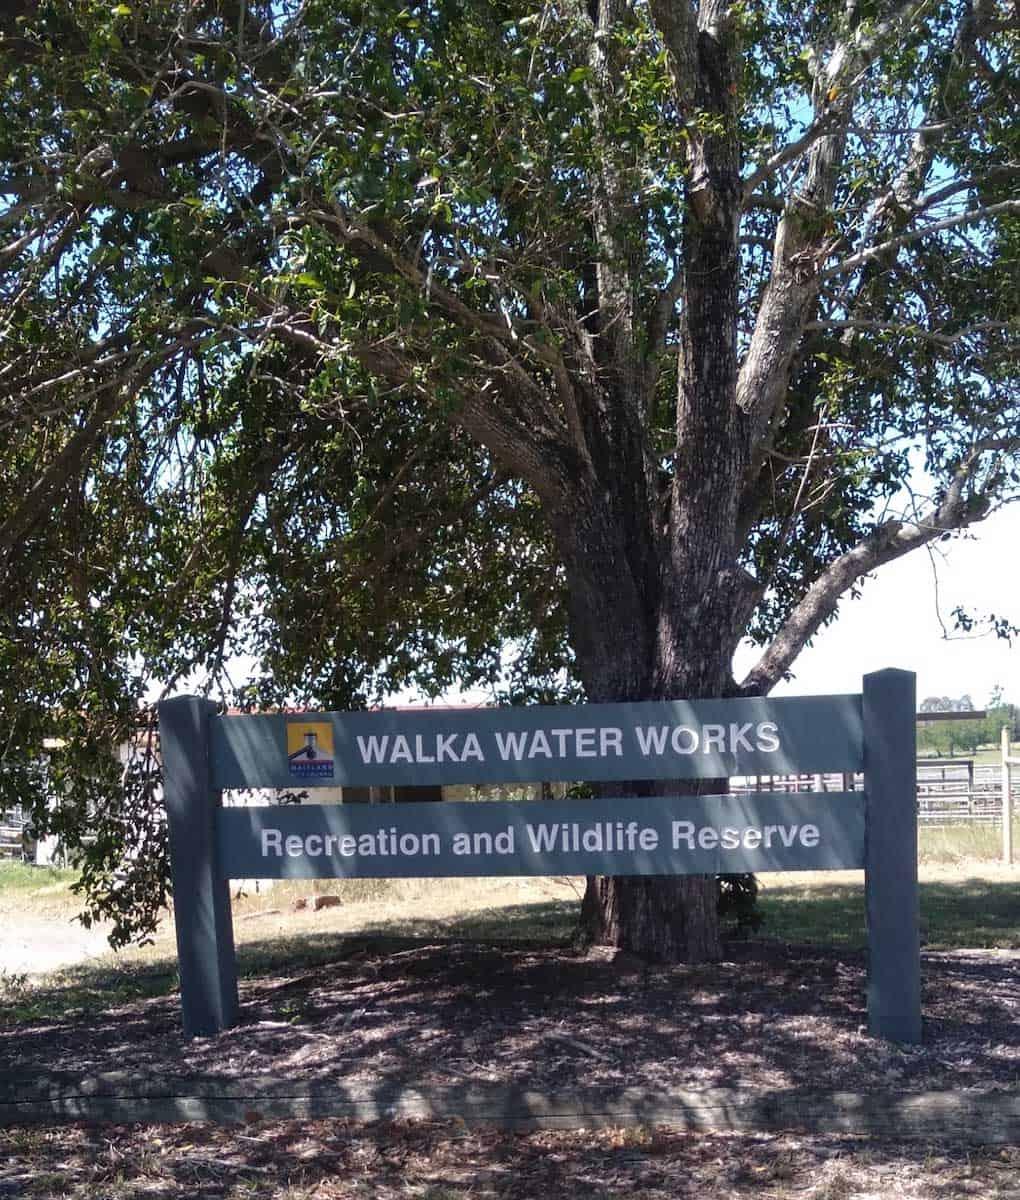 Walka Water Works Maitland